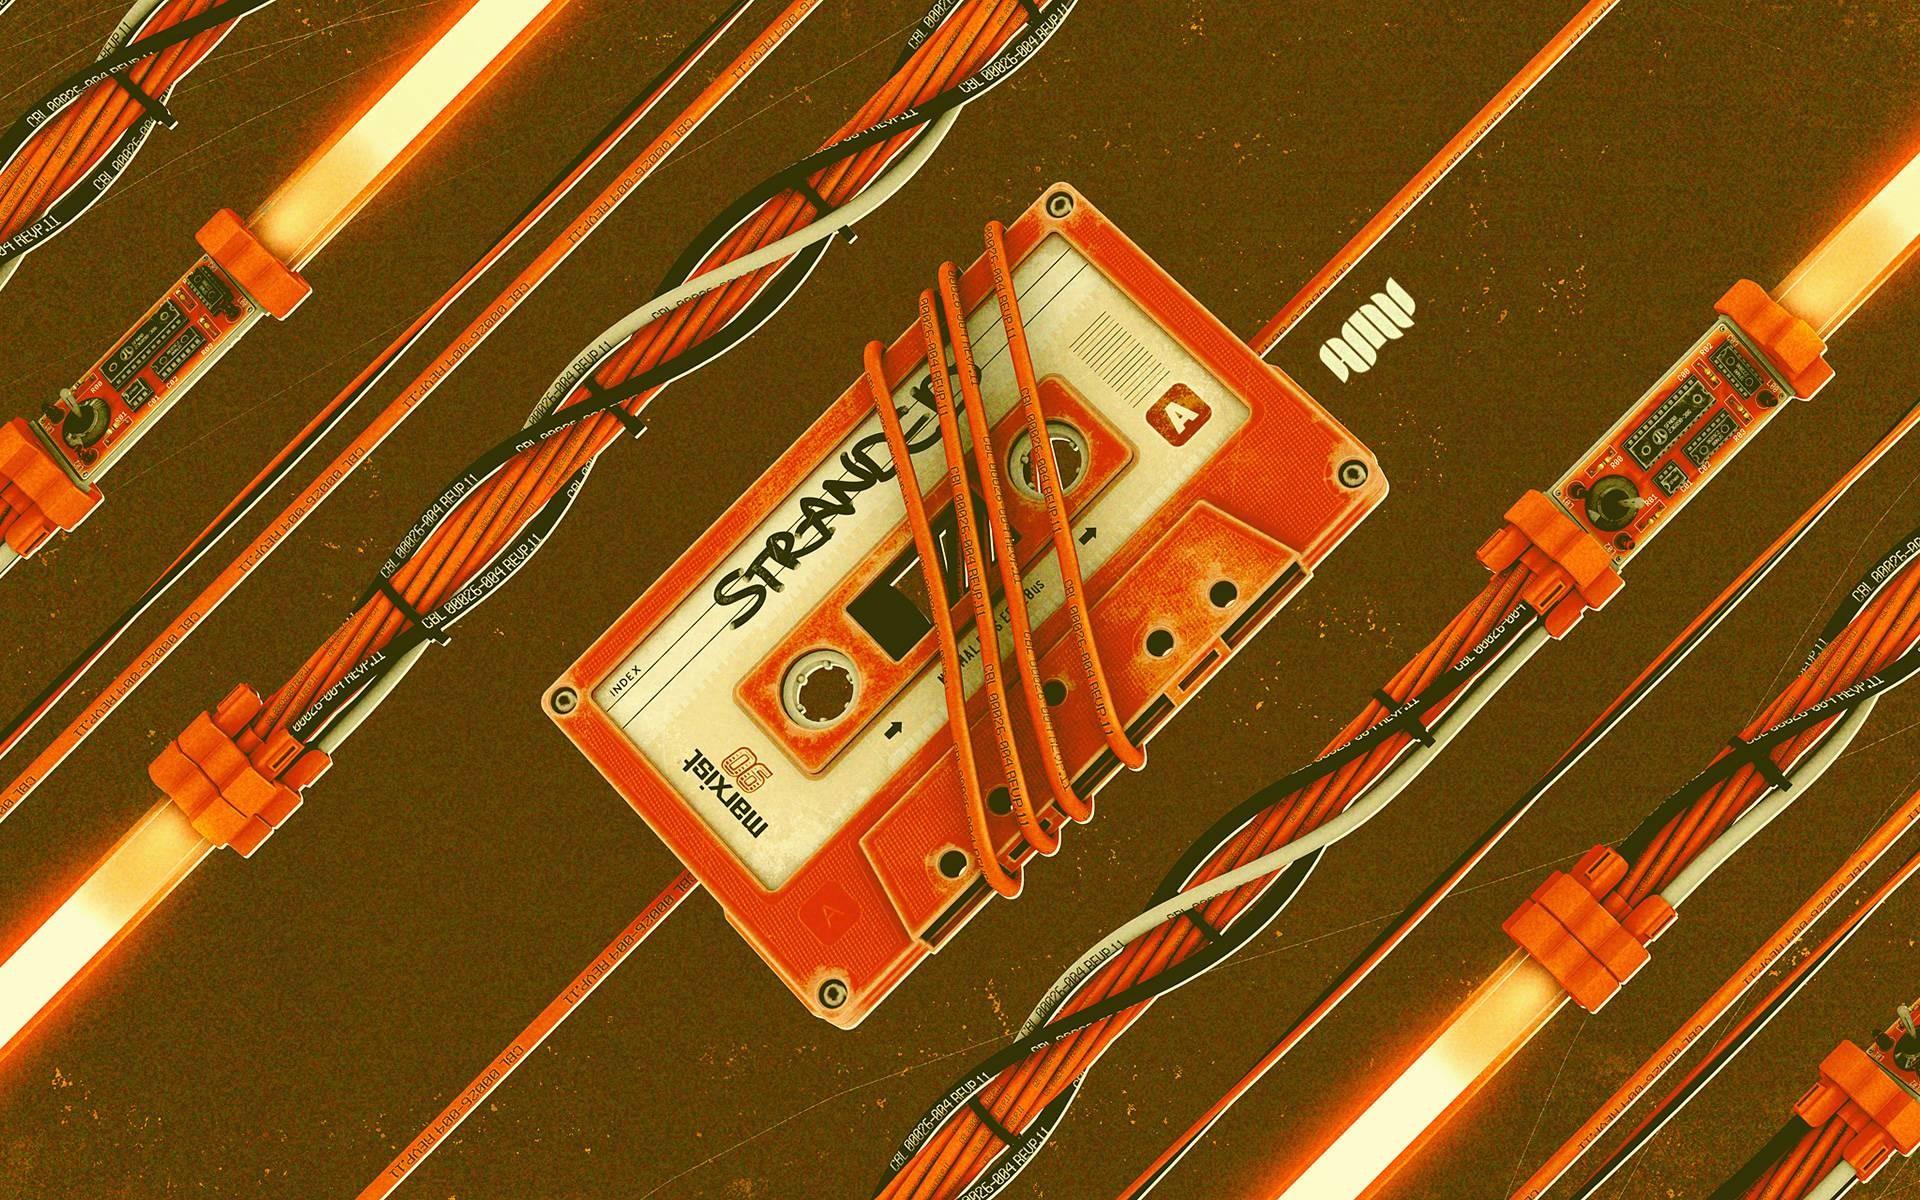 Retro Wallpaper Hd Download Desktop - Music Wallpaper Retro - HD Wallpaper